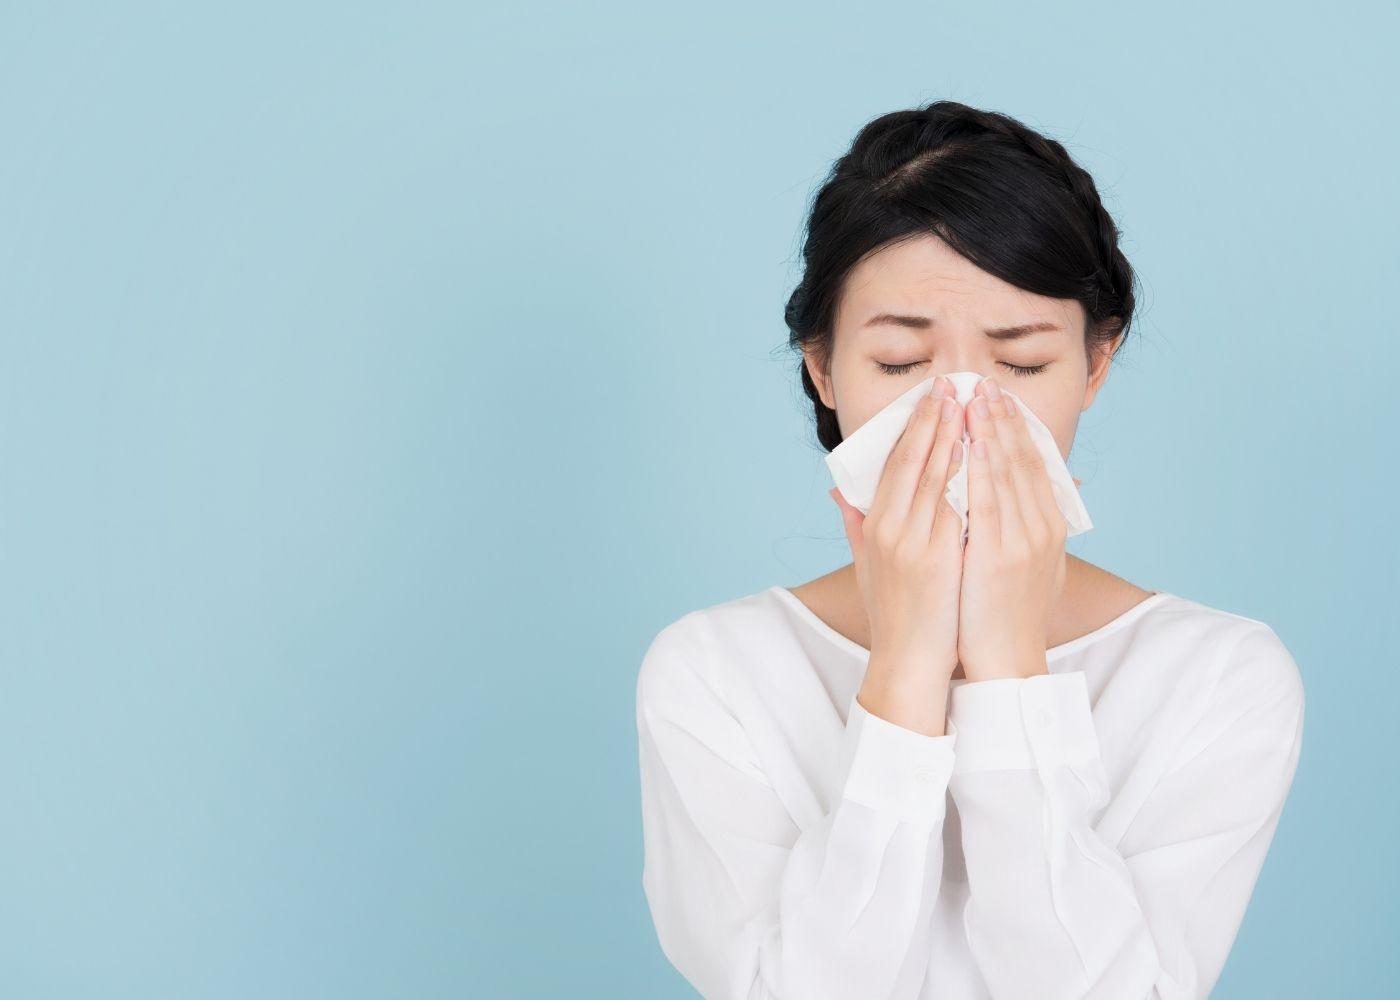 Australian allergy sufferer melbourne naturopath